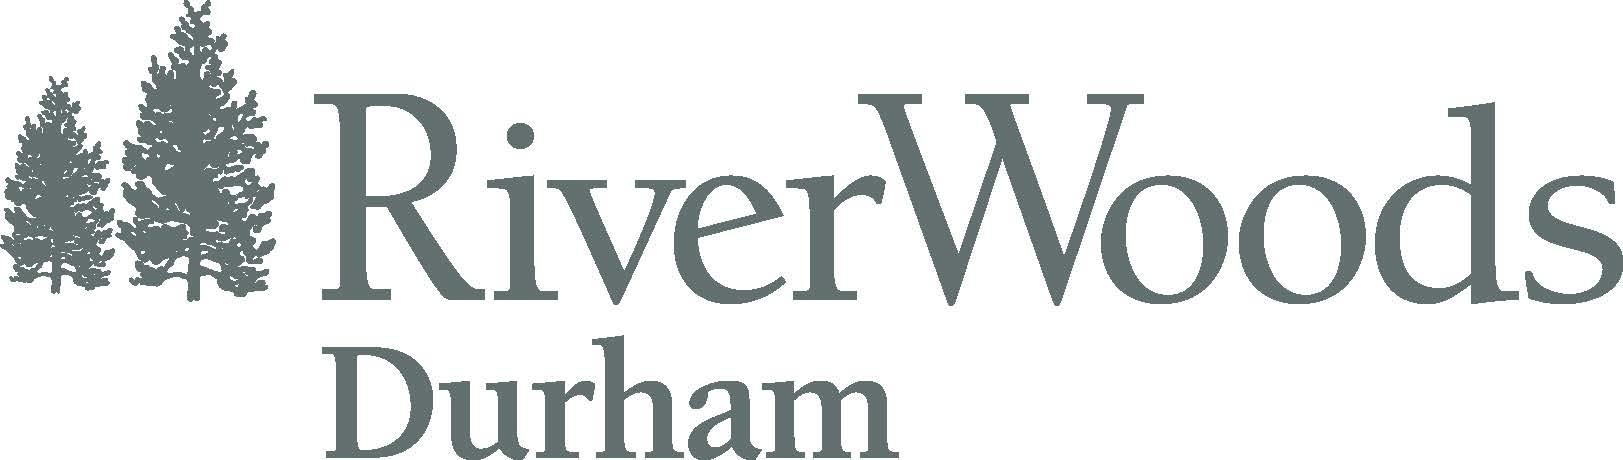 RiverWoods-Durham-logo-5477